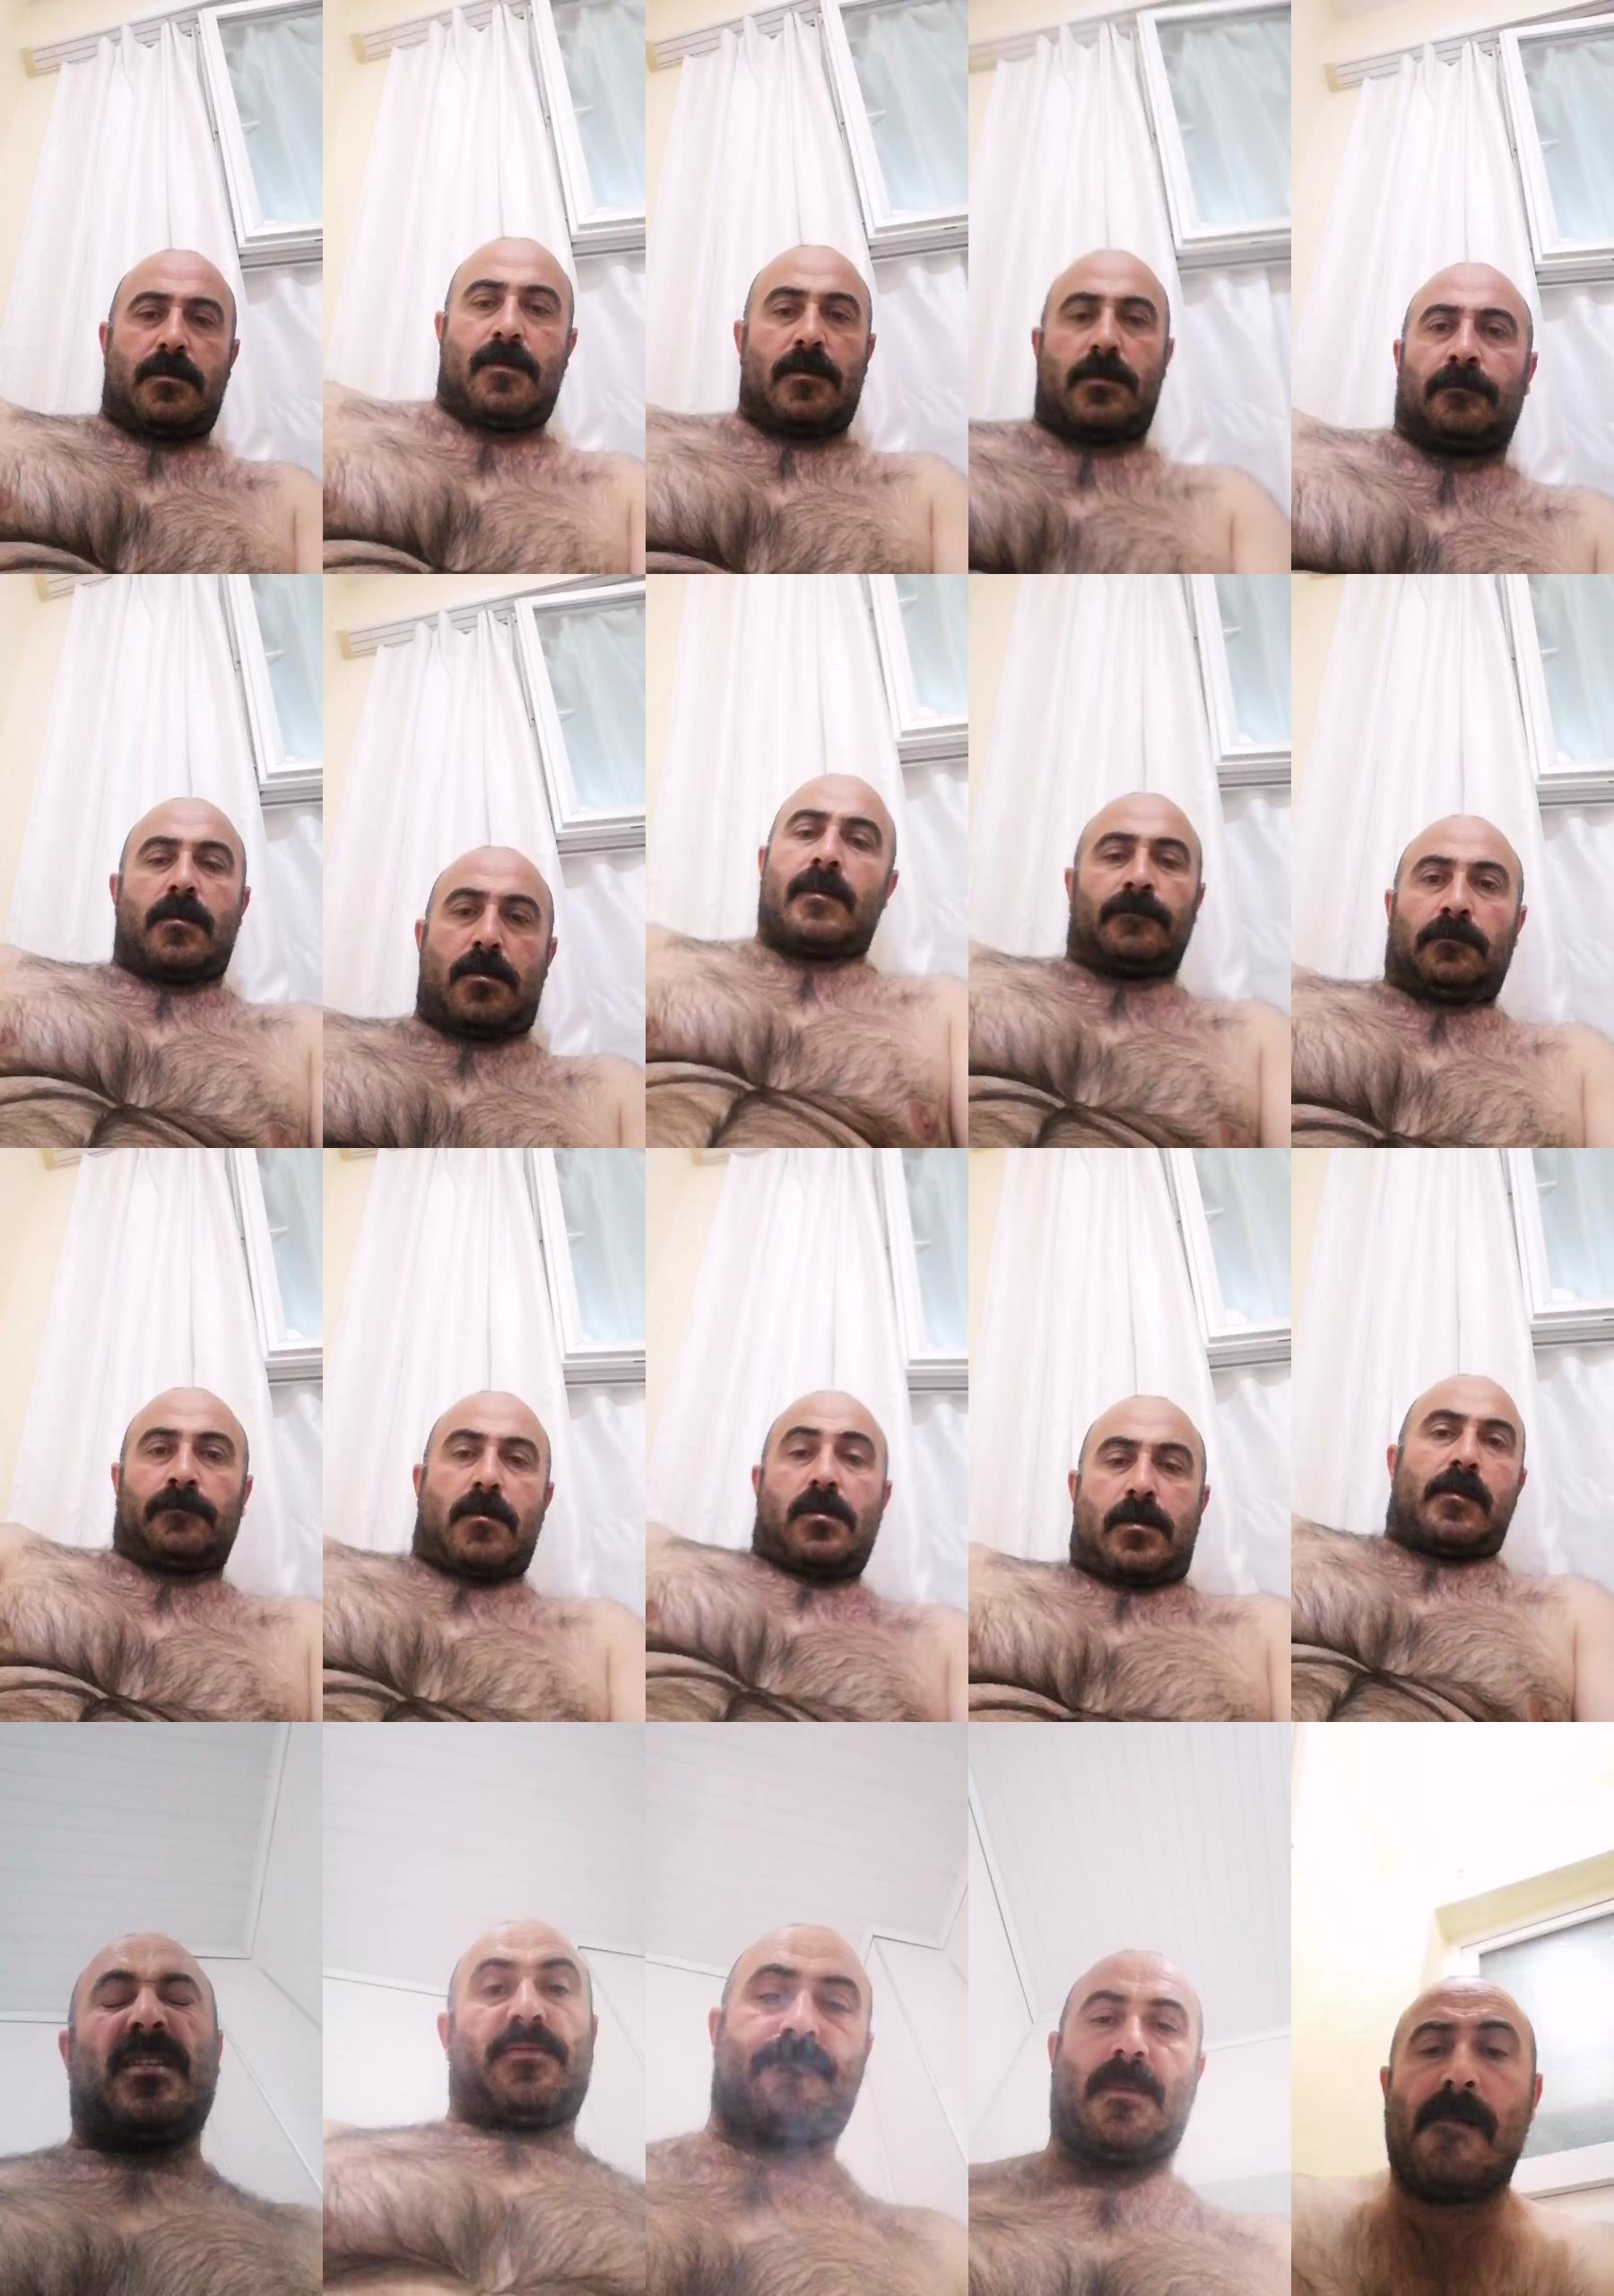 Hayriyolcu Cam4 28-07-2021 Recorded Video XXX